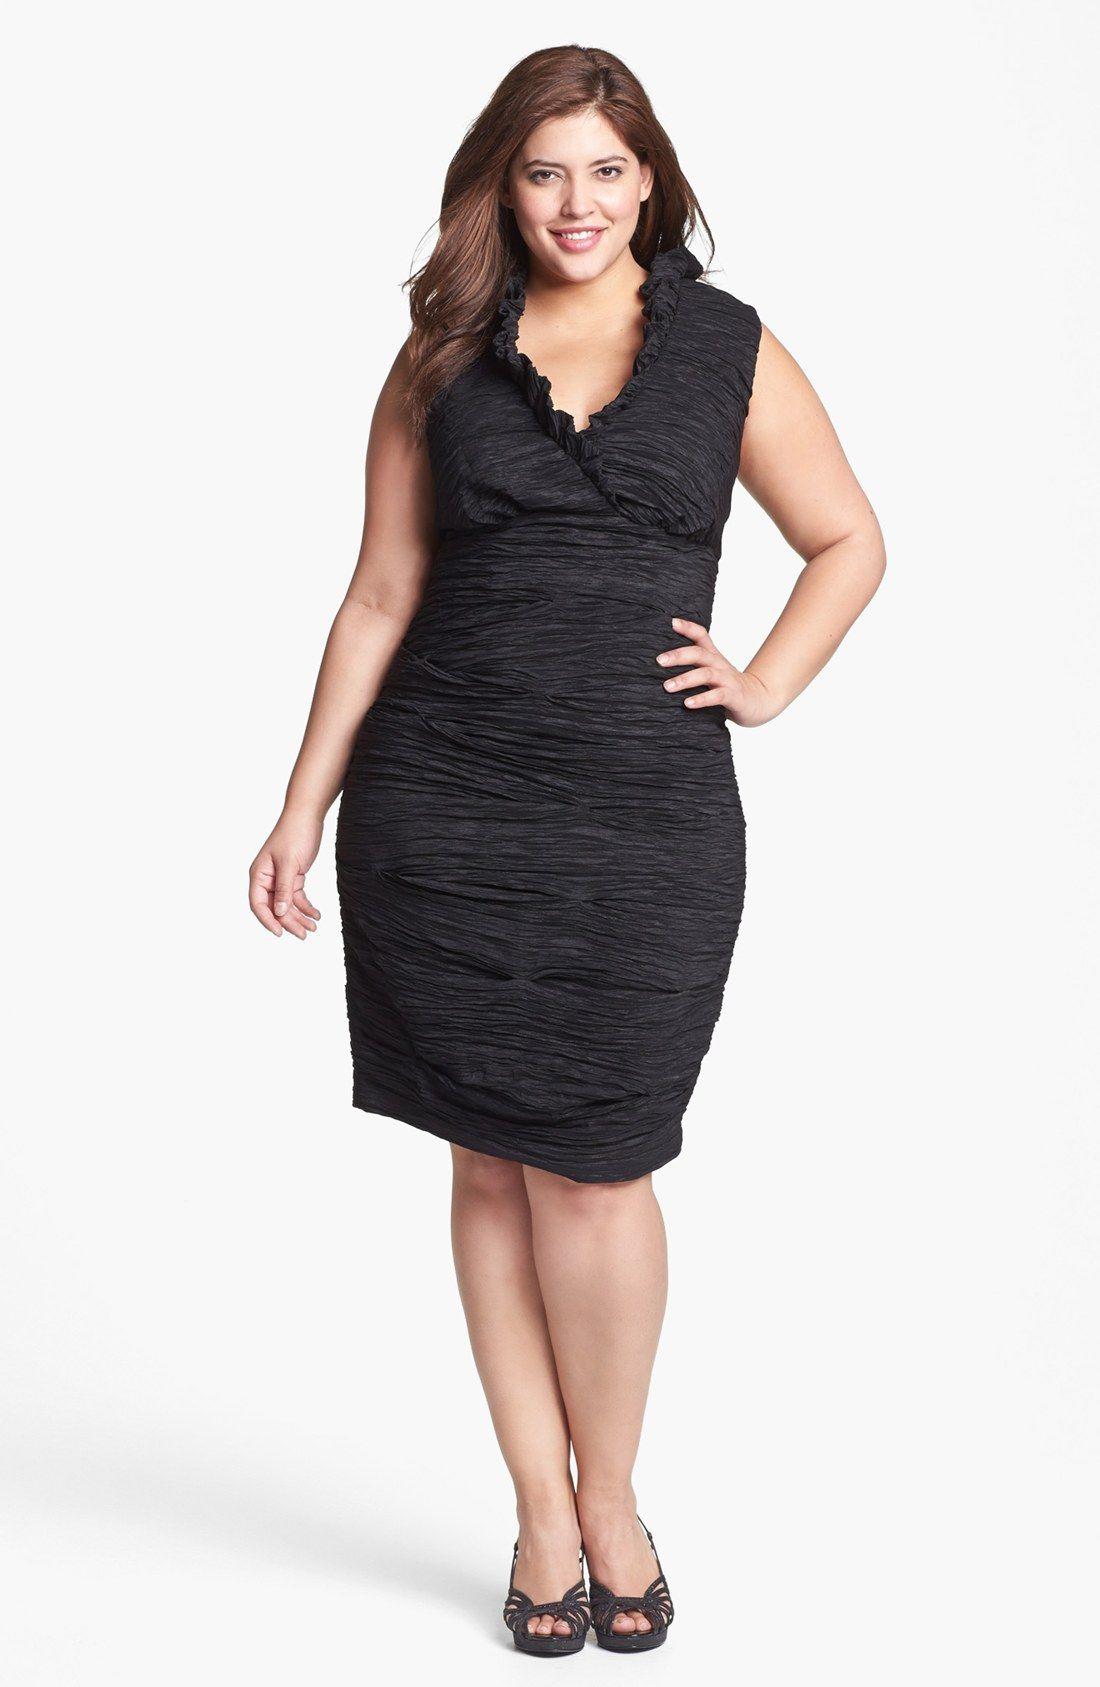 Calvin Klein Ruched Sheath Dress Plus Size Nordstrom Plus Size Formal Dresses Big Girl Dresses Sheath Dress [ 1687 x 1100 Pixel ]